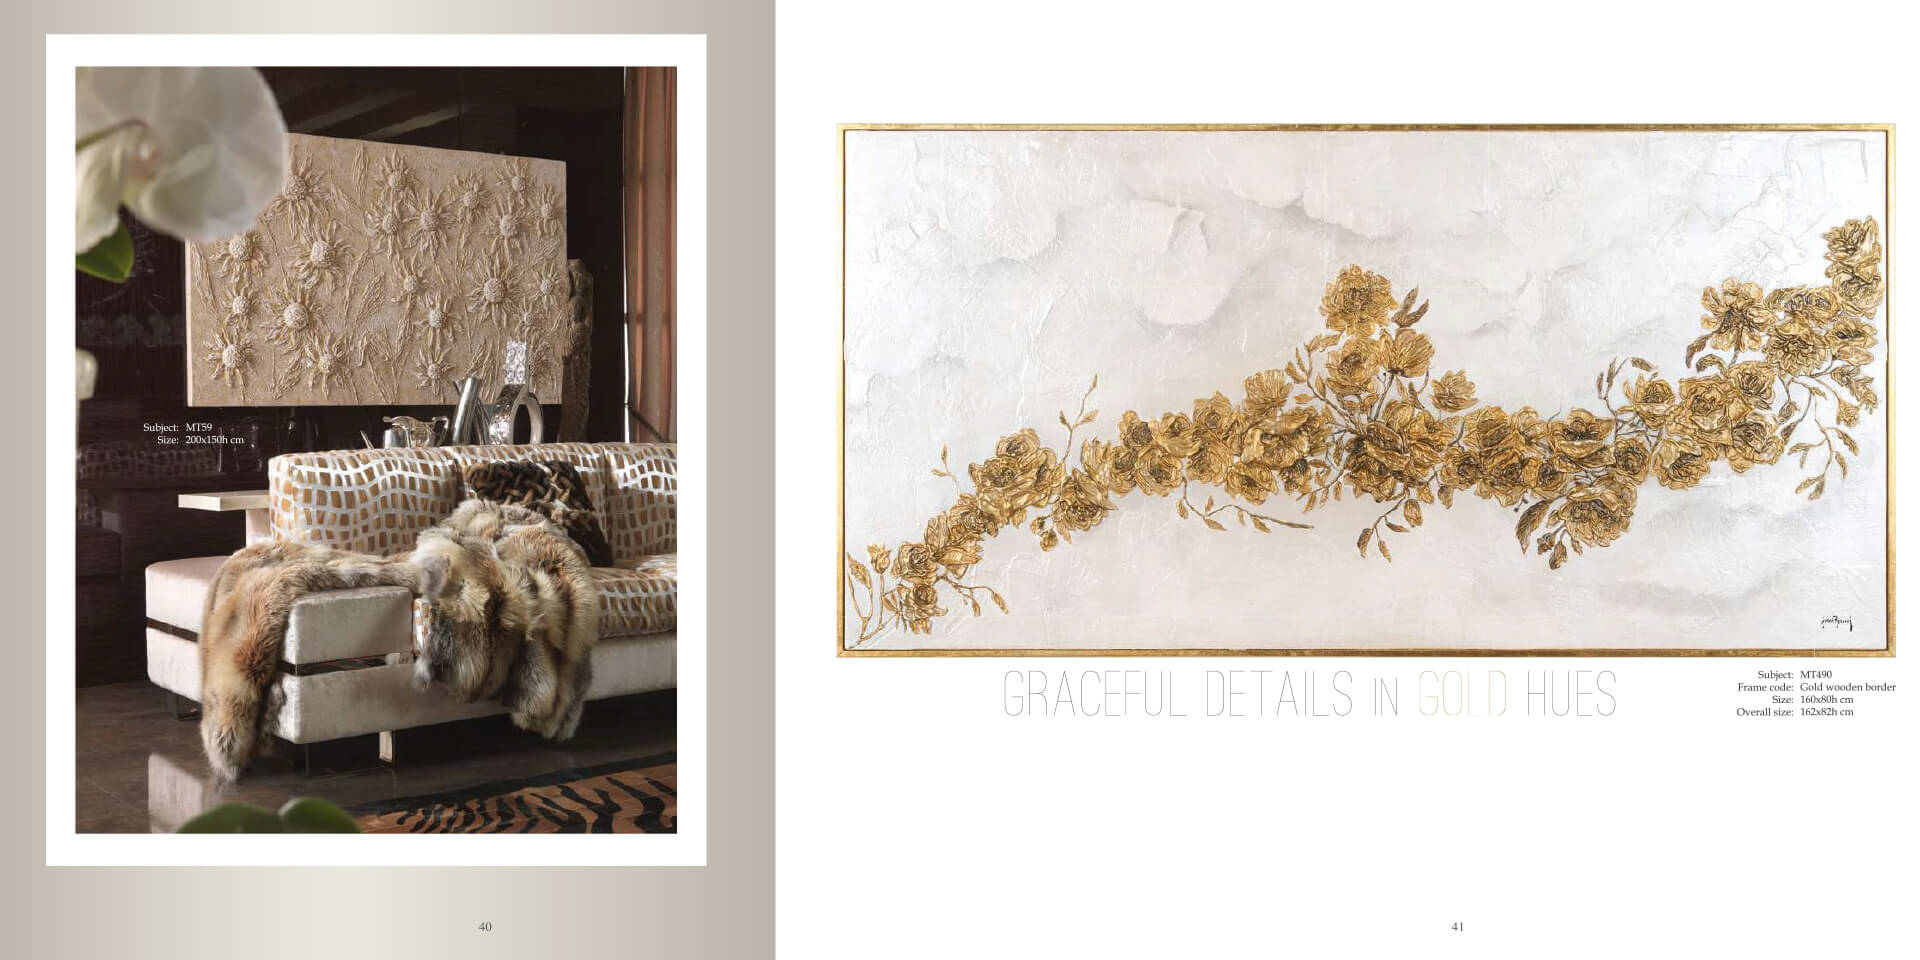 Contemporary Art Catalogue Vol2 Extract